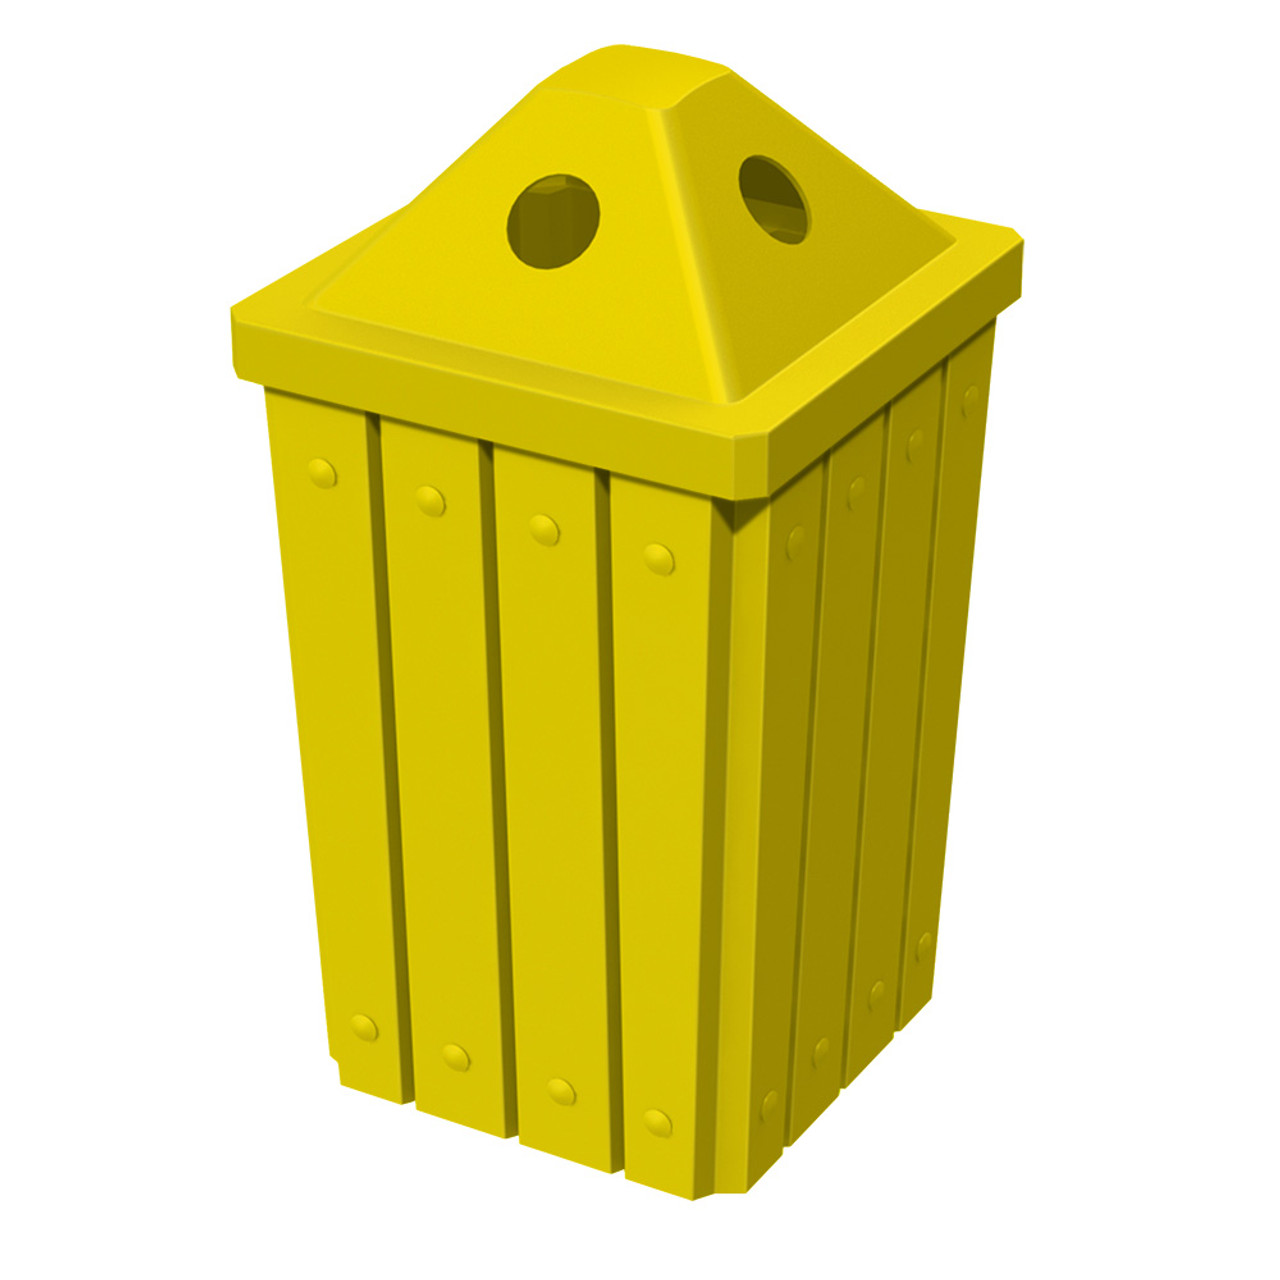 32 Gallon Kolor Can Heavy Duty Pyramid Lid Recycle Bin S8297A-00 YELLOW